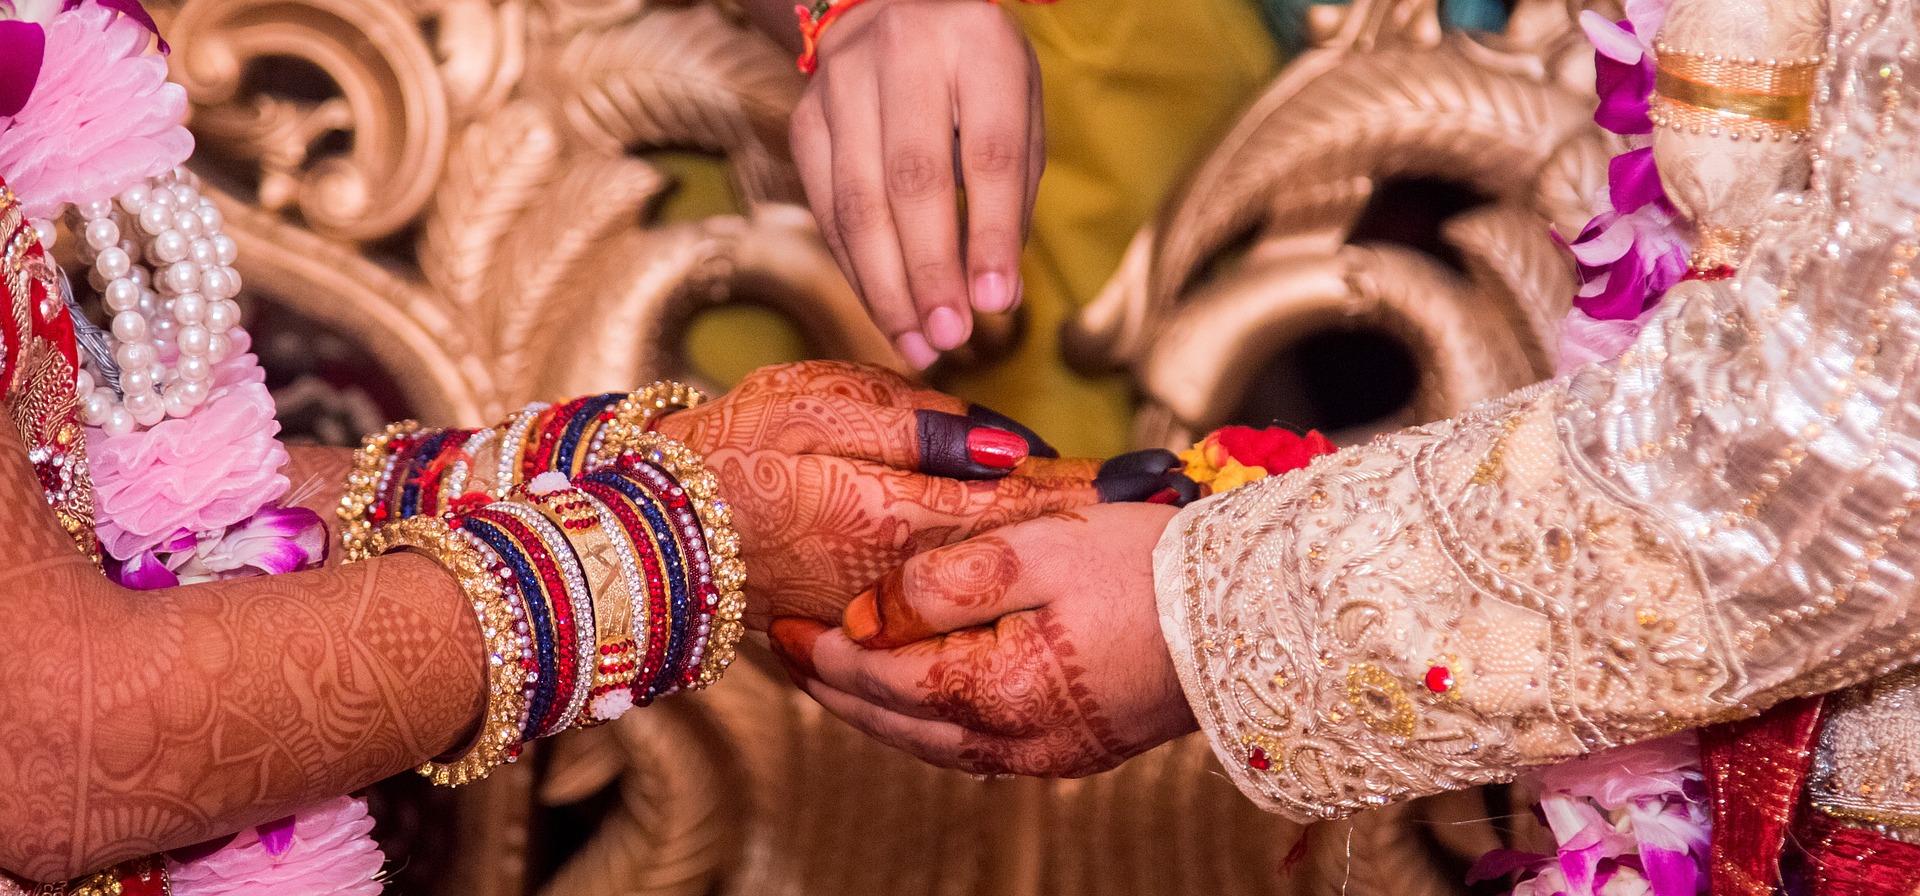 hand-holding-1404623_1920.jpg